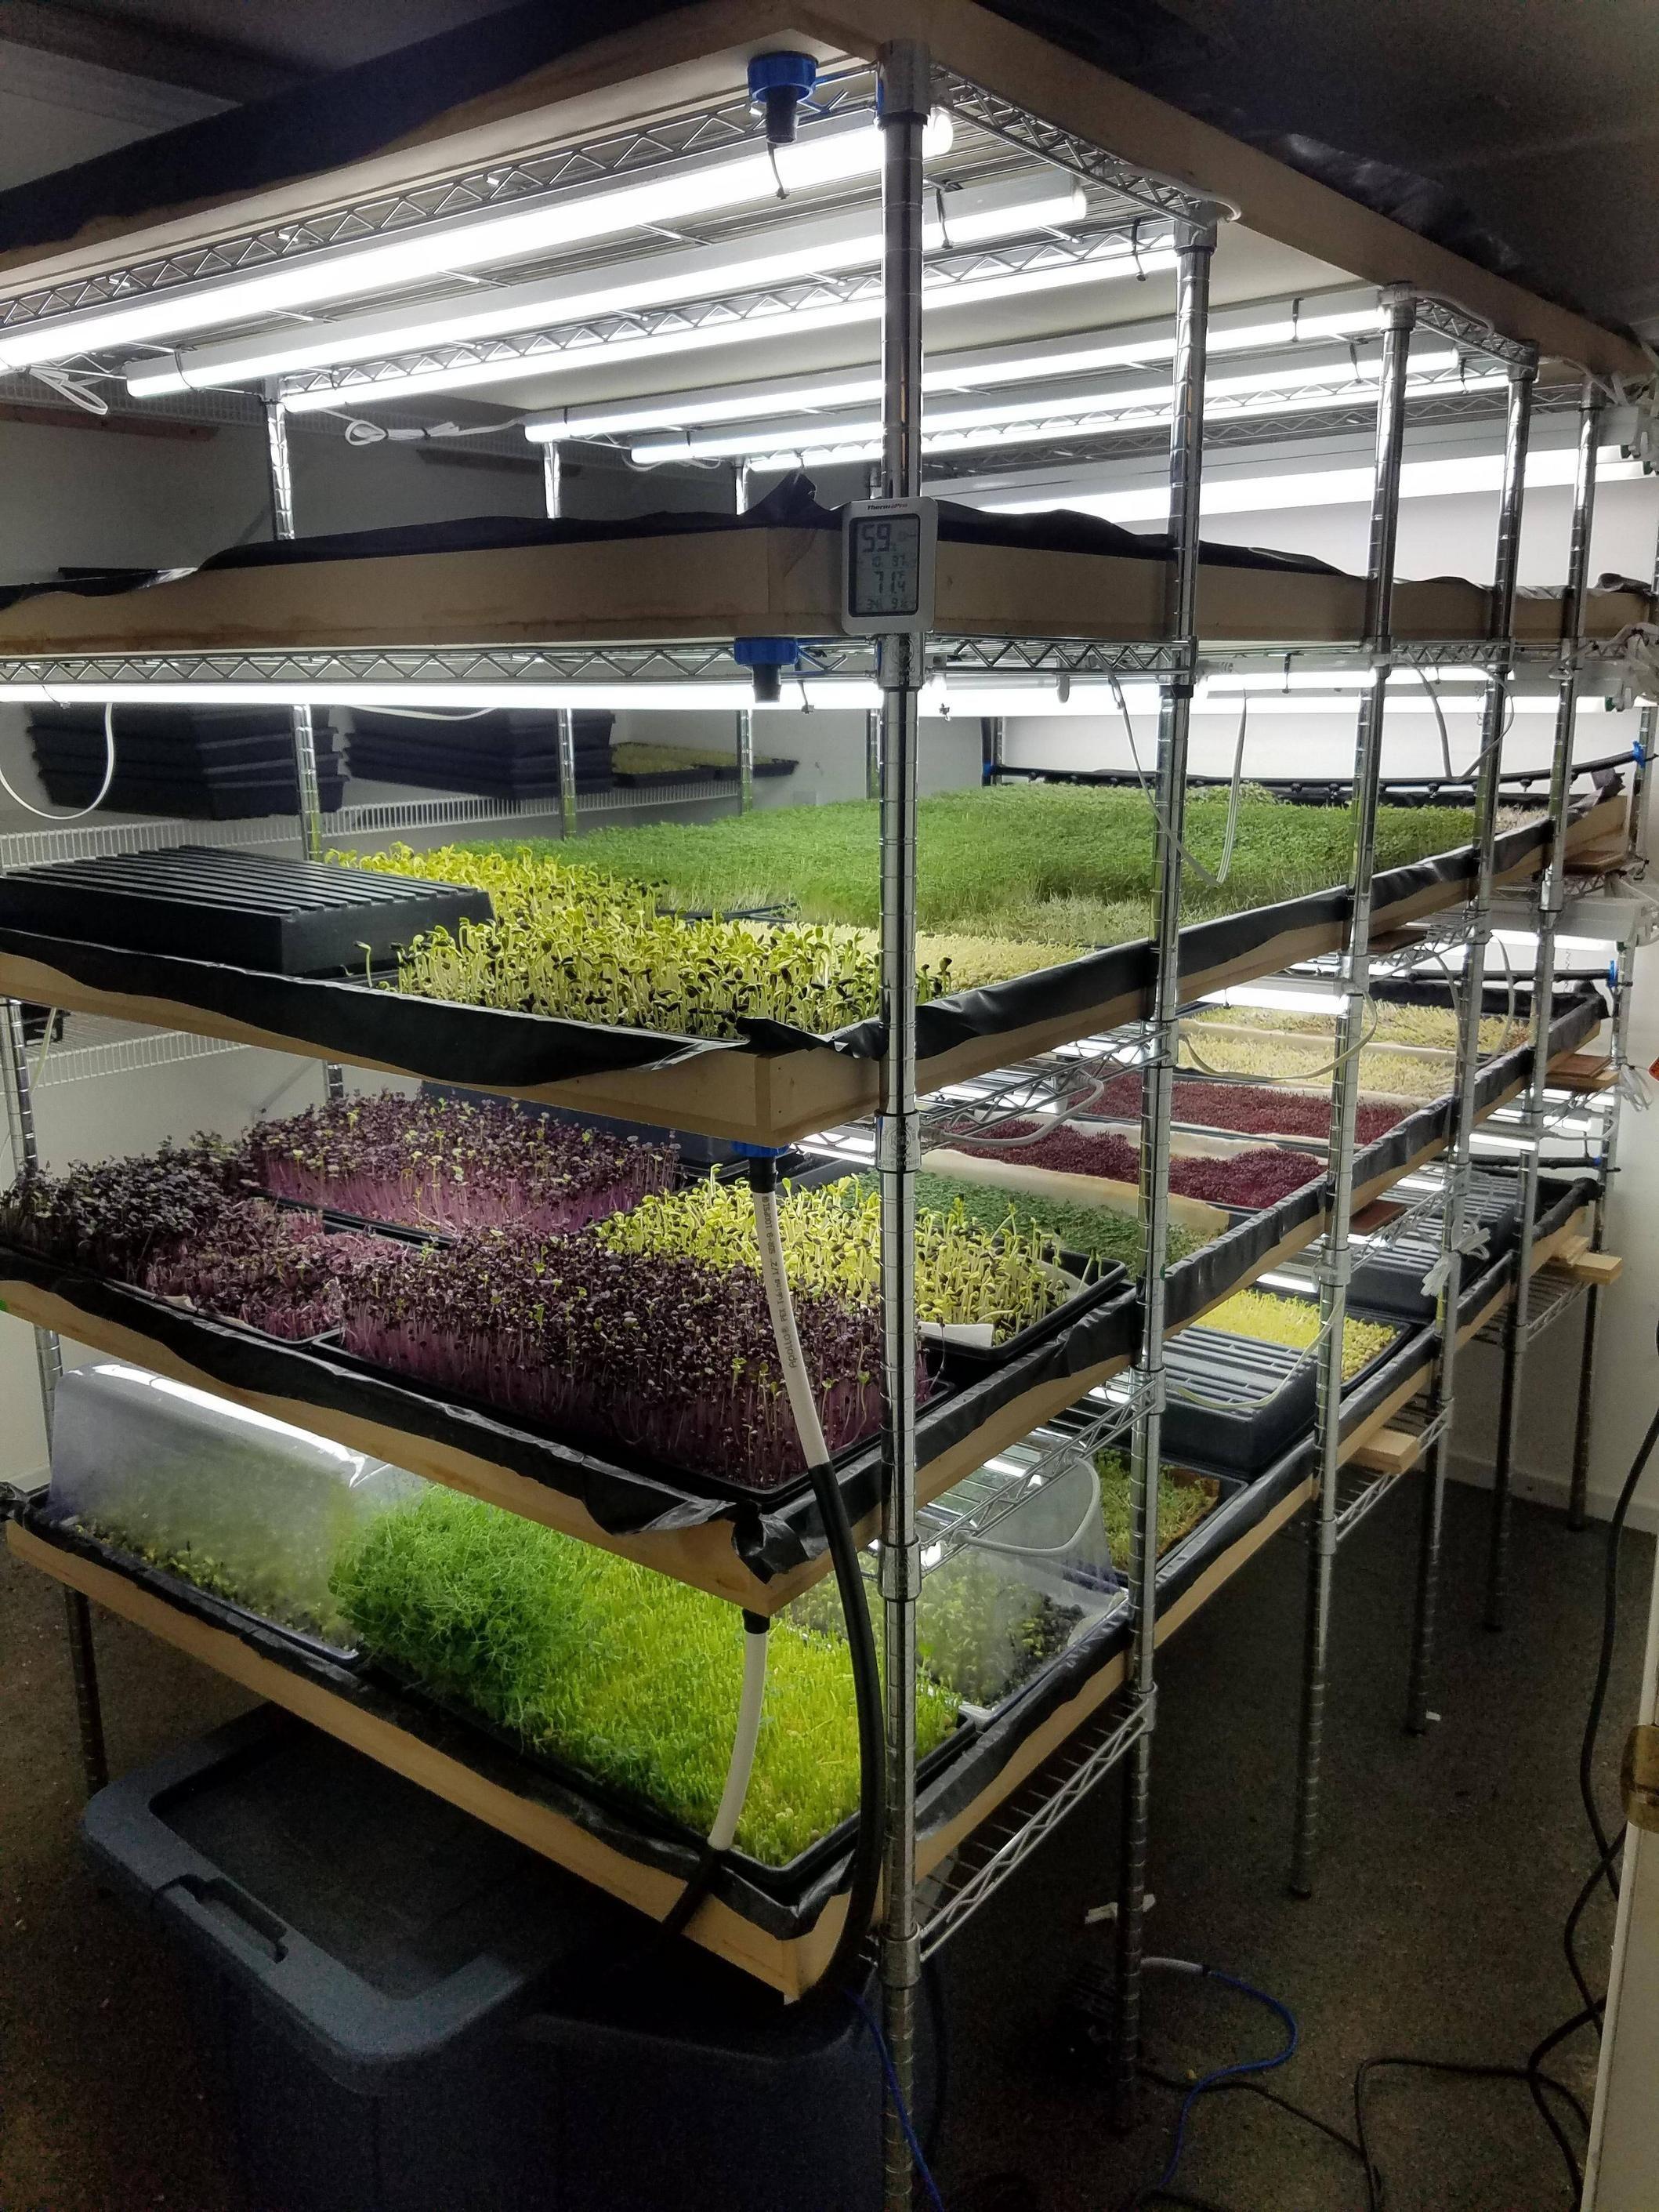 Grow Room Setup: Microgreens! Our New Grow Room Setup Is Working Out Swell